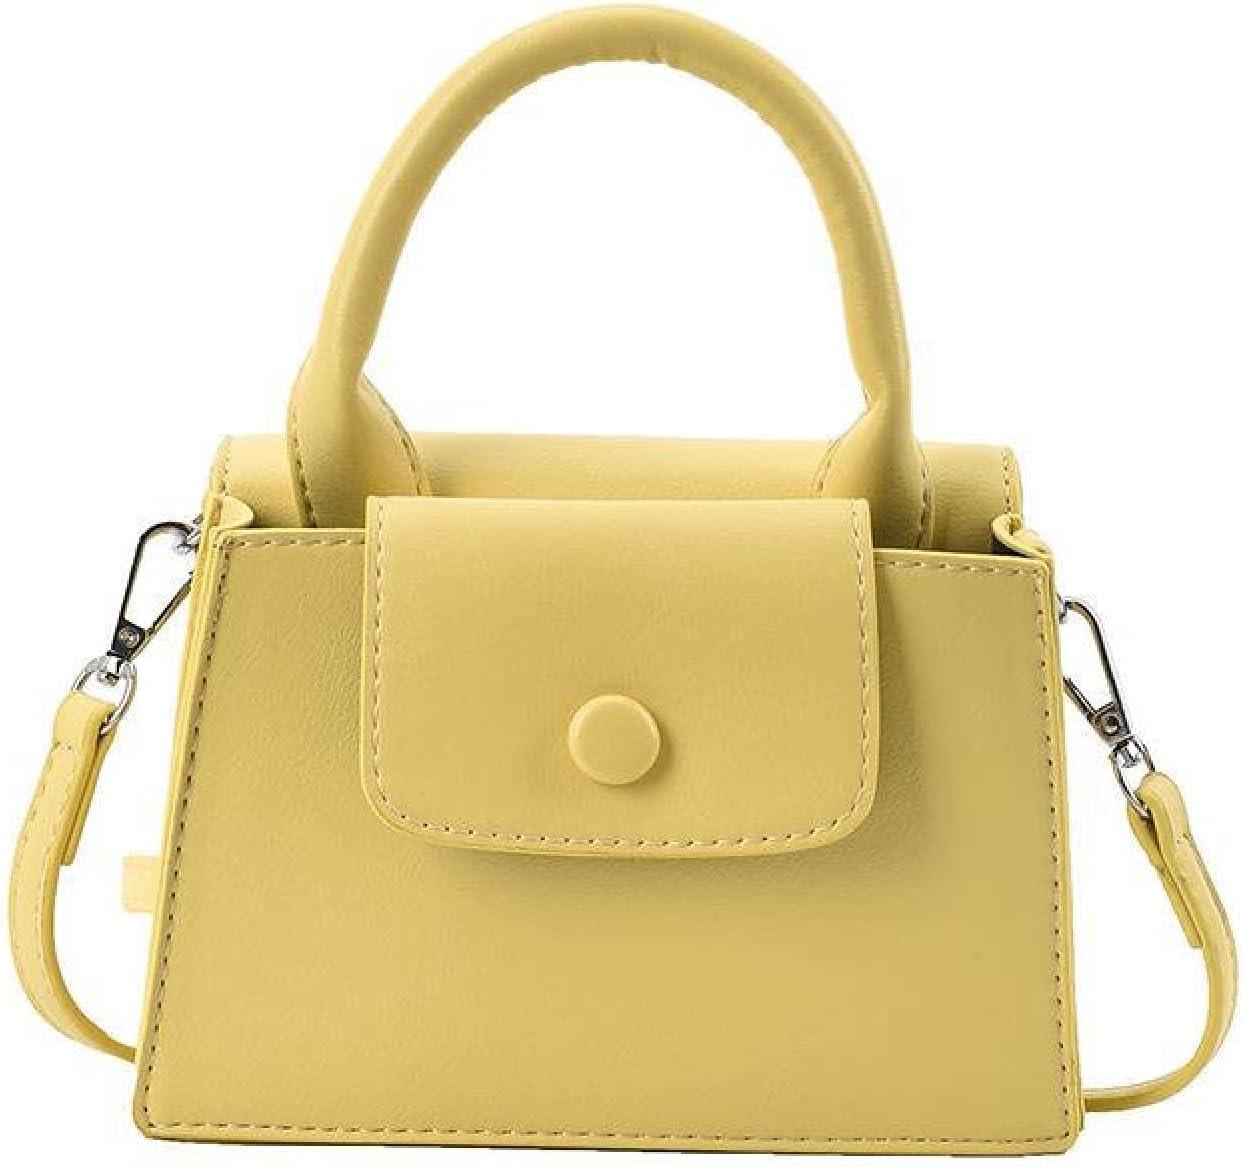 NC Simple Casual Solid Color Women's Bag 2021 Commuter one-Shoulder Bag Handbag Under The Bag Stiletto Bag Women's Summer (Yellow)